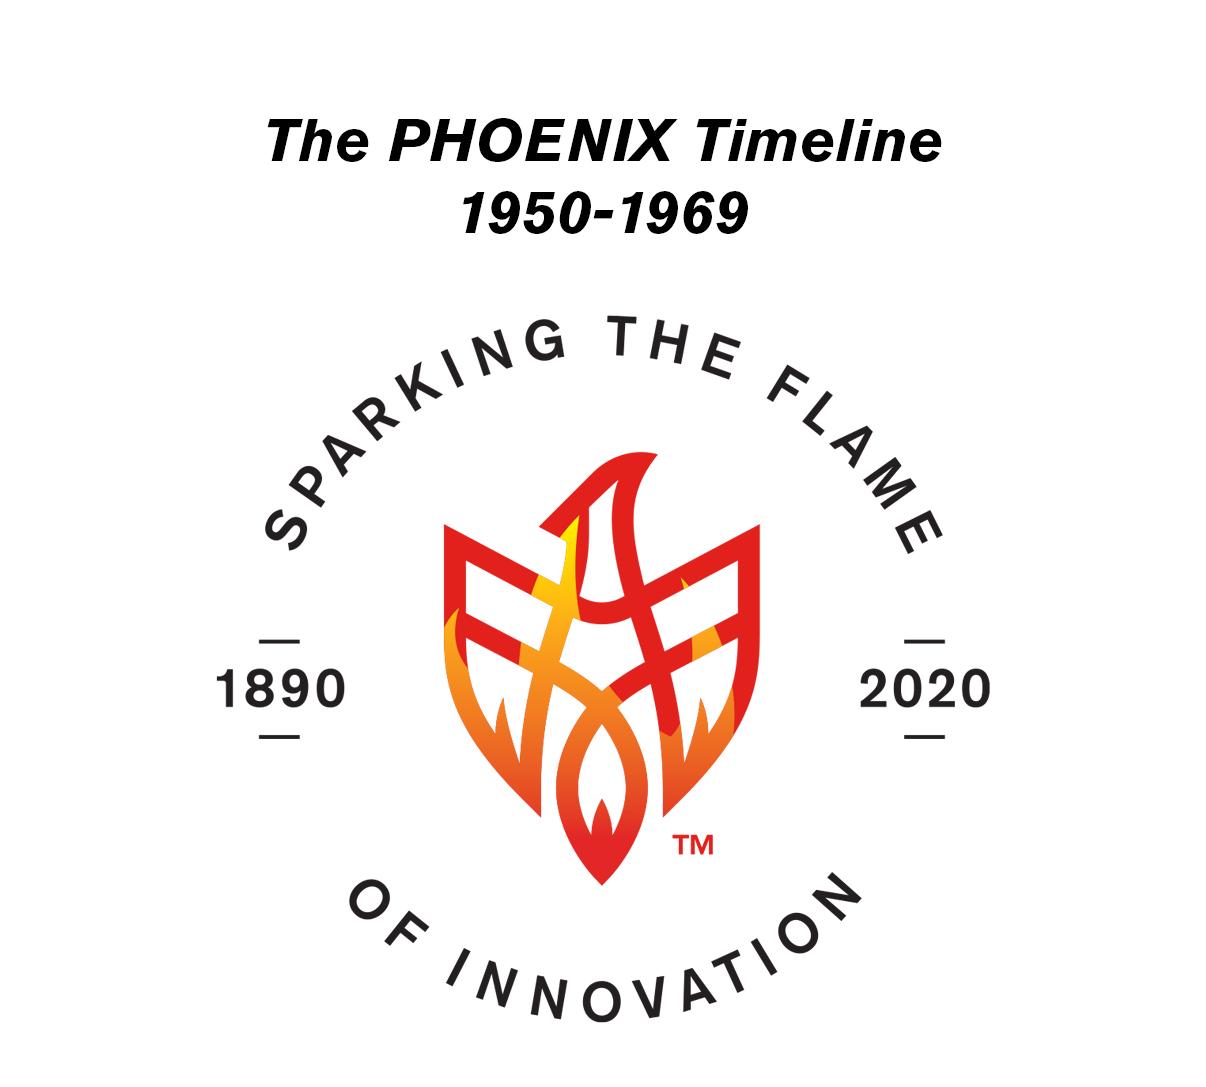 PHOENIX Celebrates 130 Years: 1950-1969 Timeline